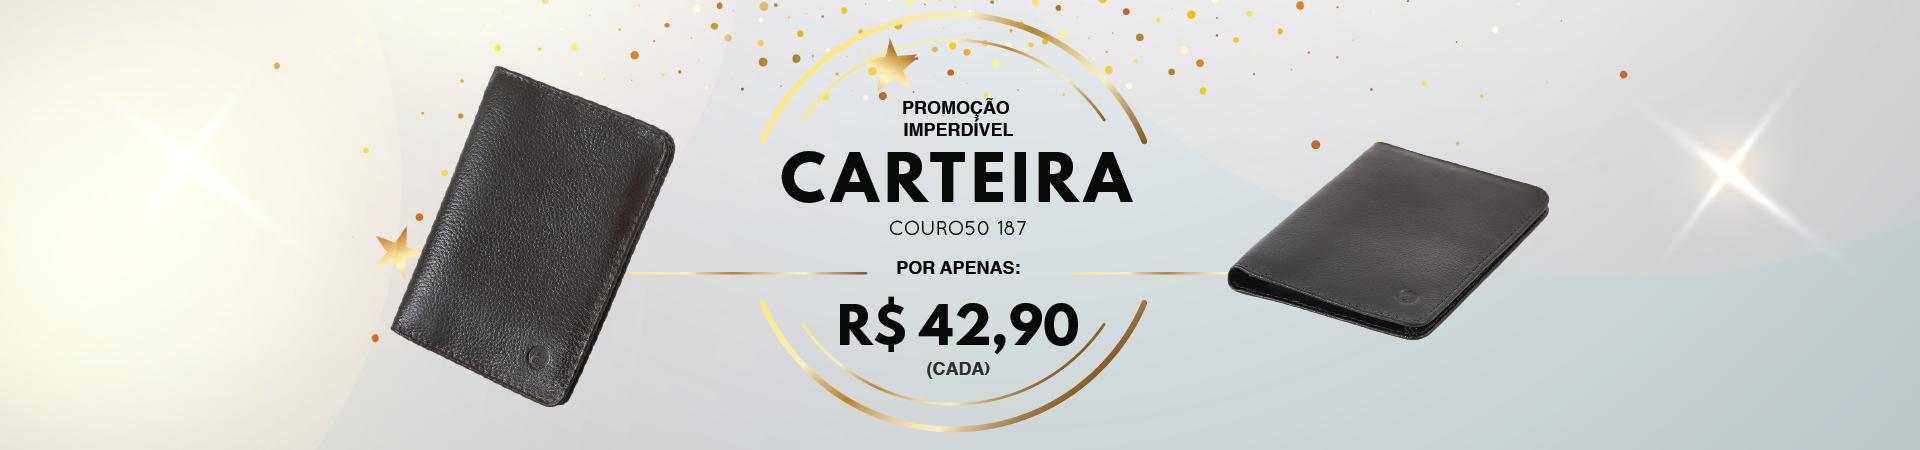 COURO50 BOLSA CARTEIRA 2190 237